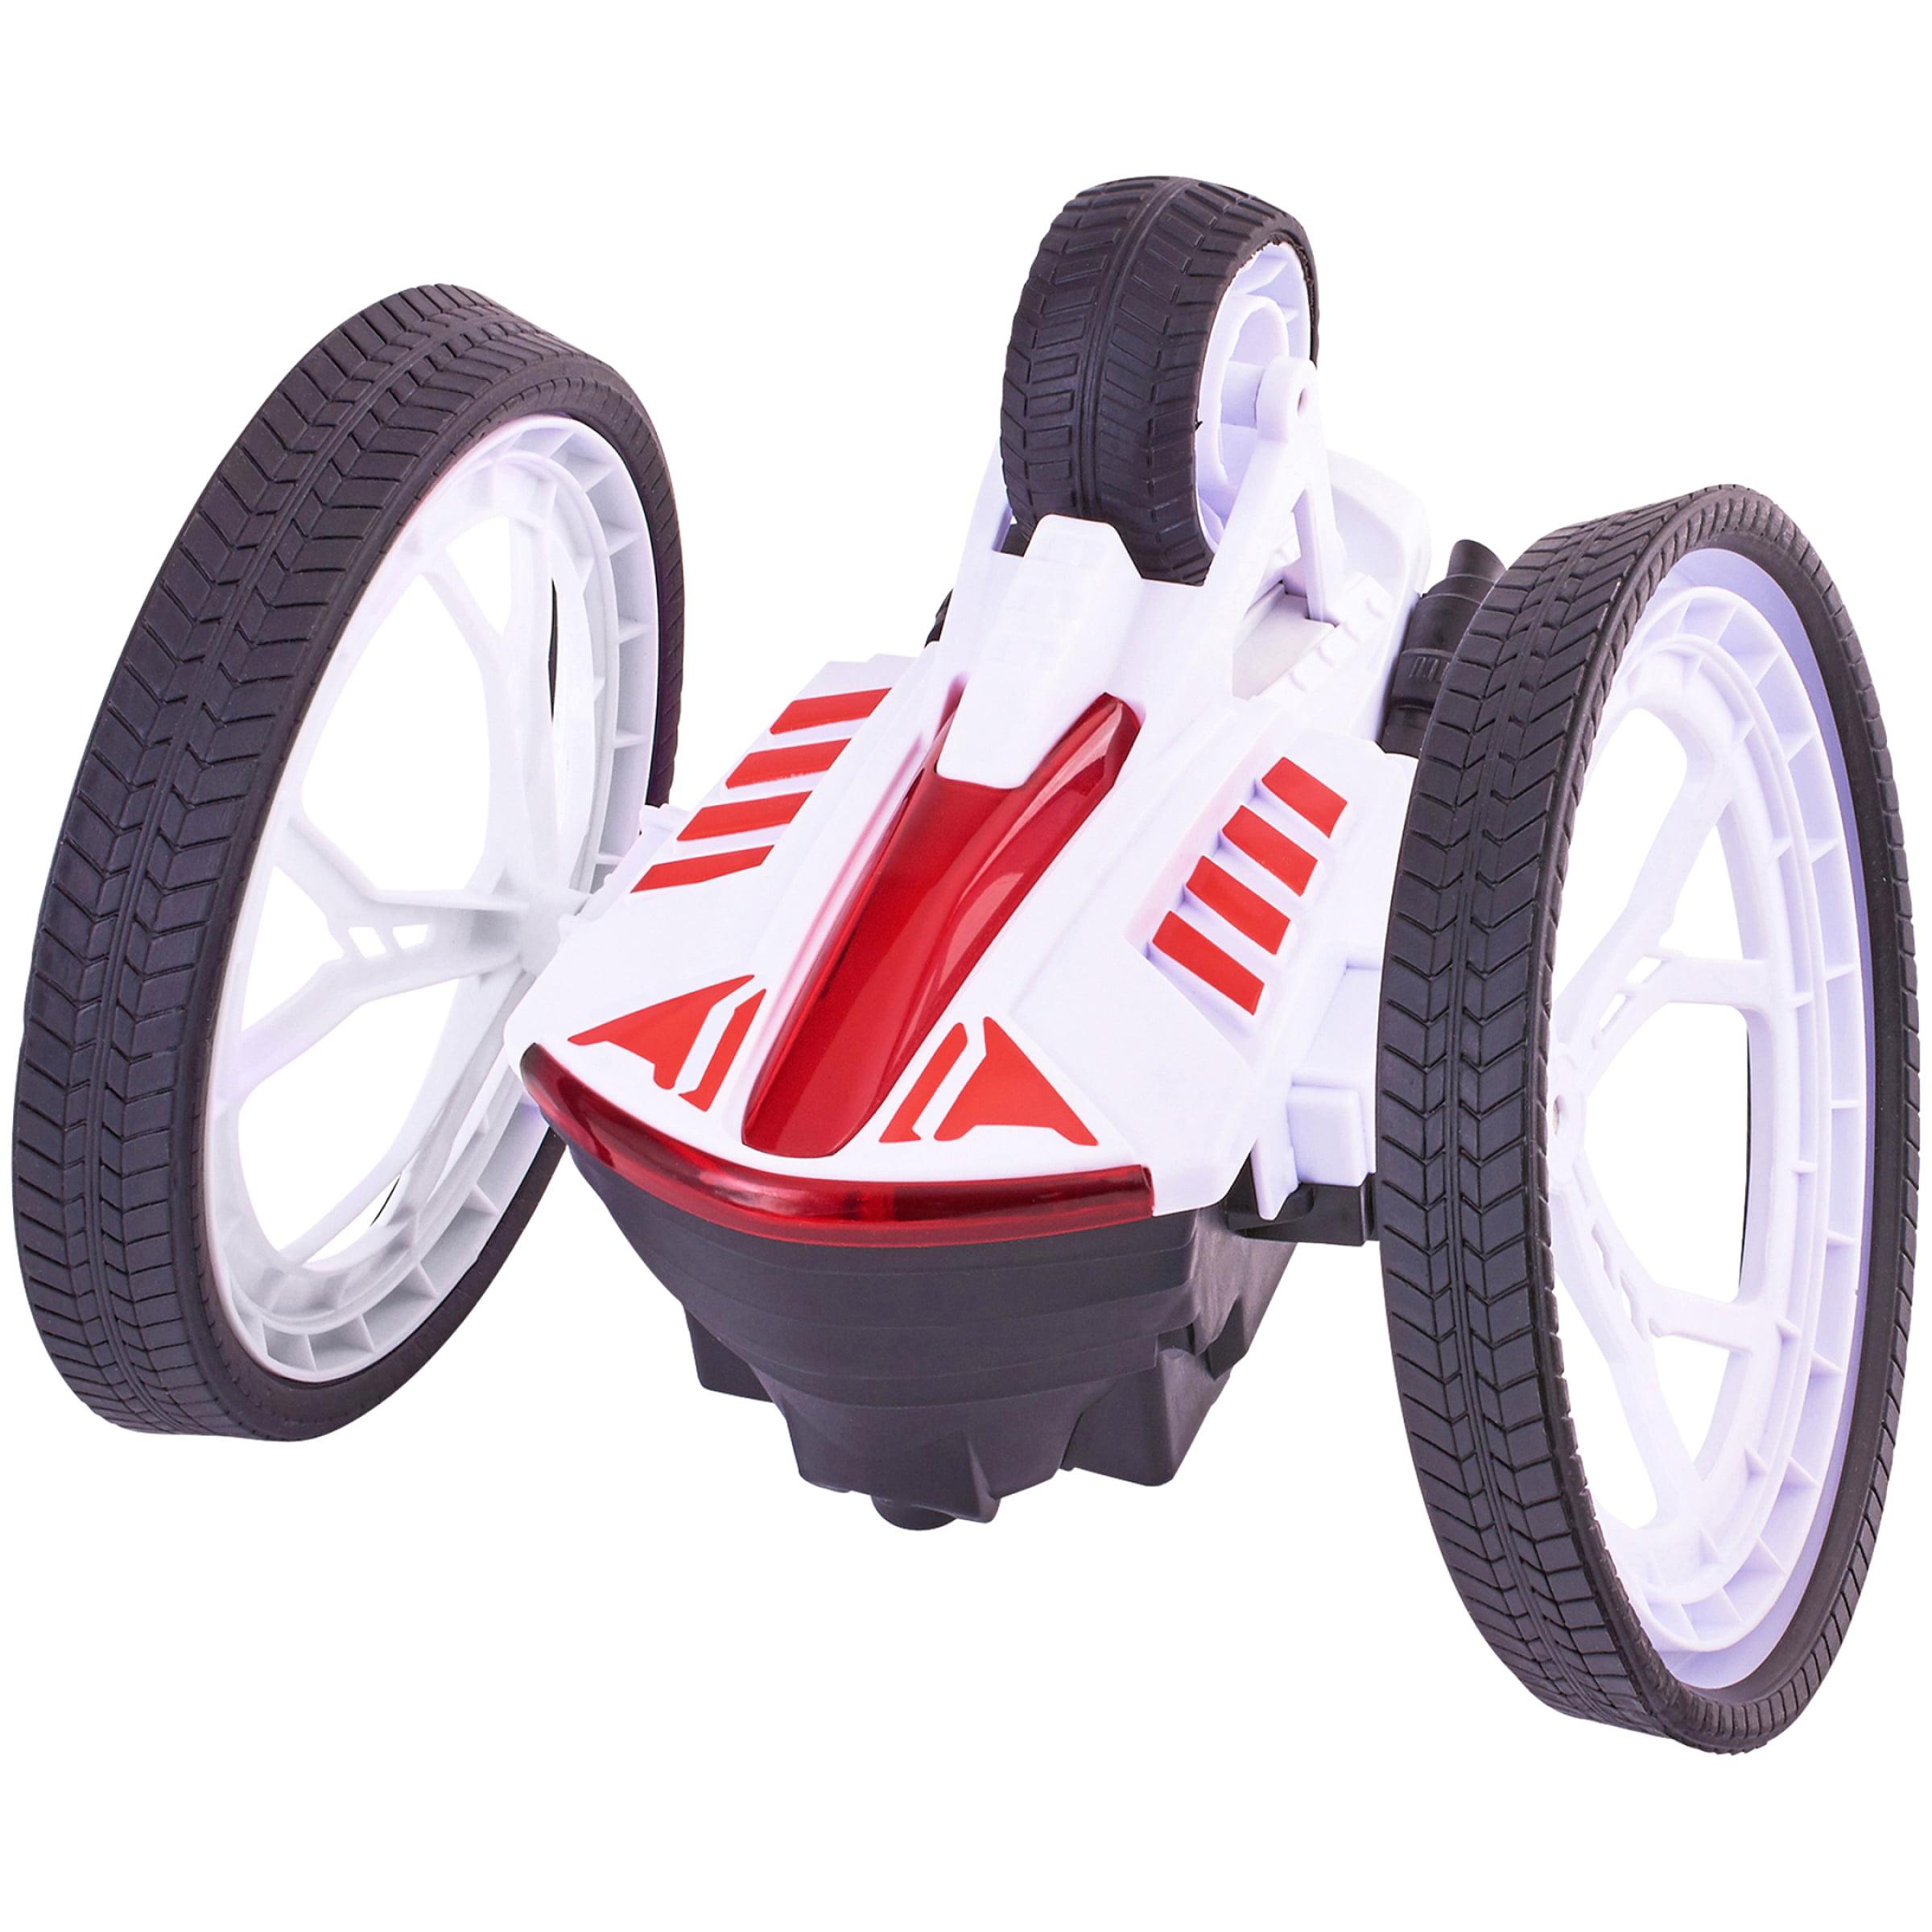 Adventure Force Max Rumbler Radio Controlled Stunt Vehicle